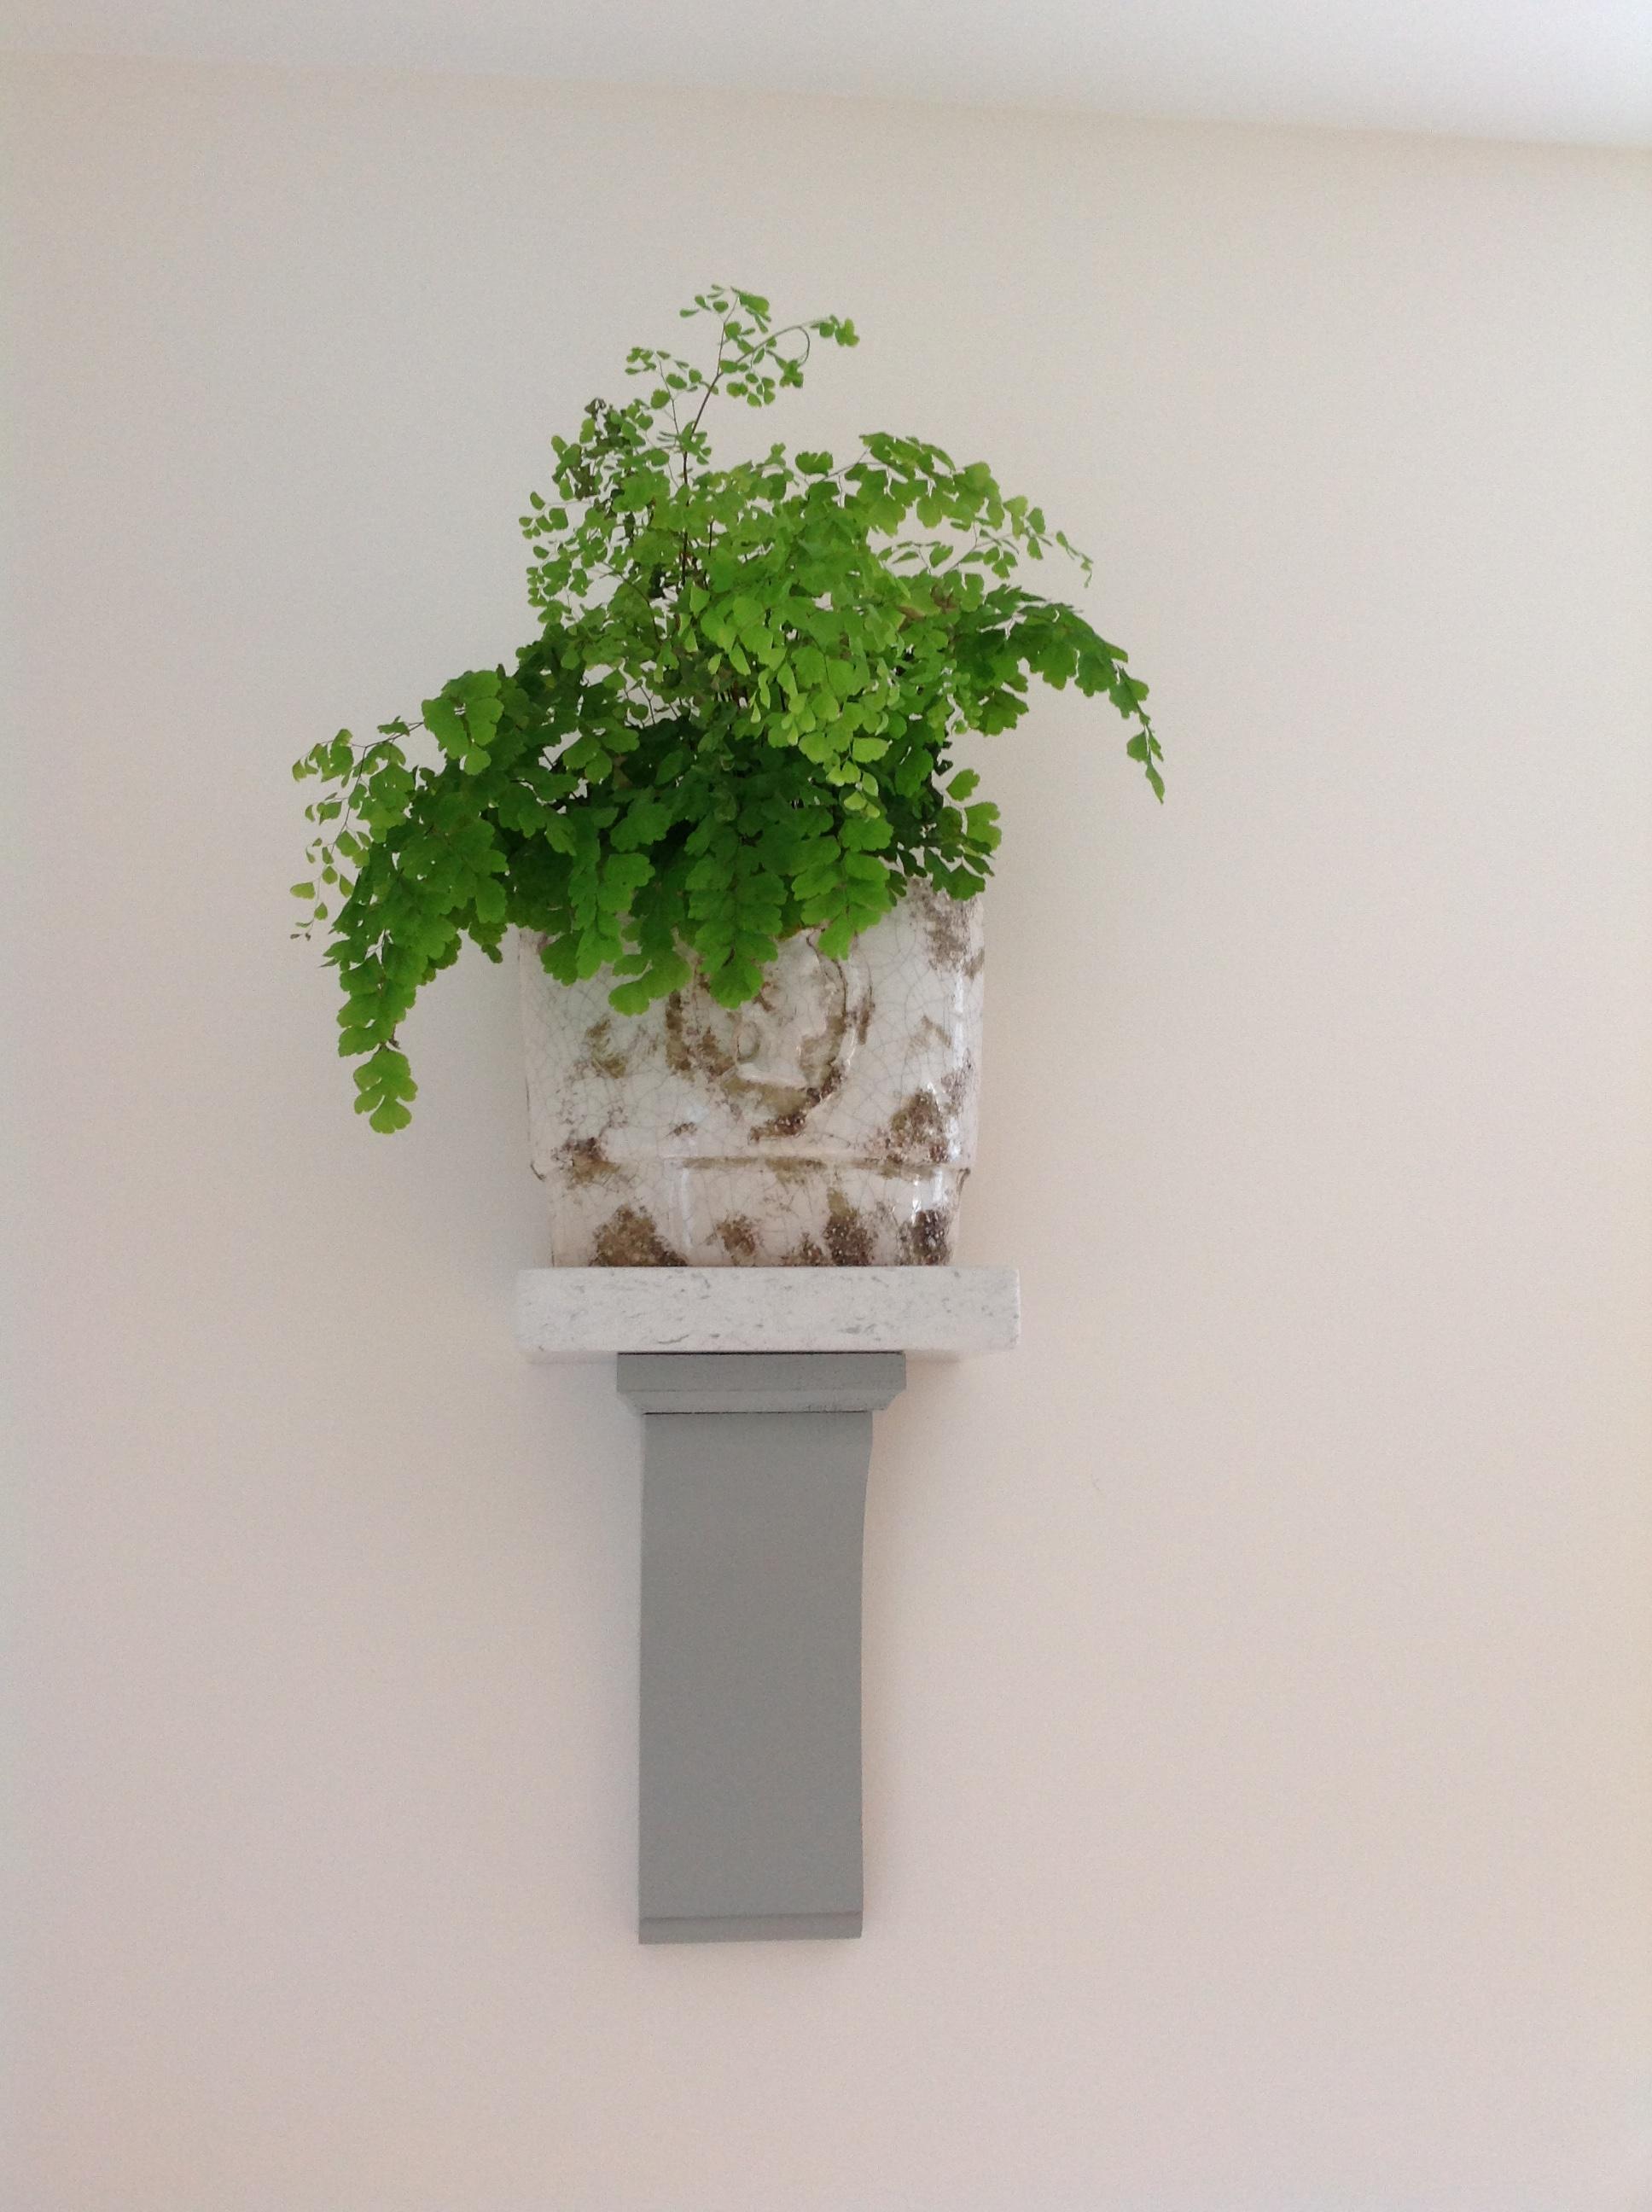 Burbridge Erin Kitchen corbel with house plant